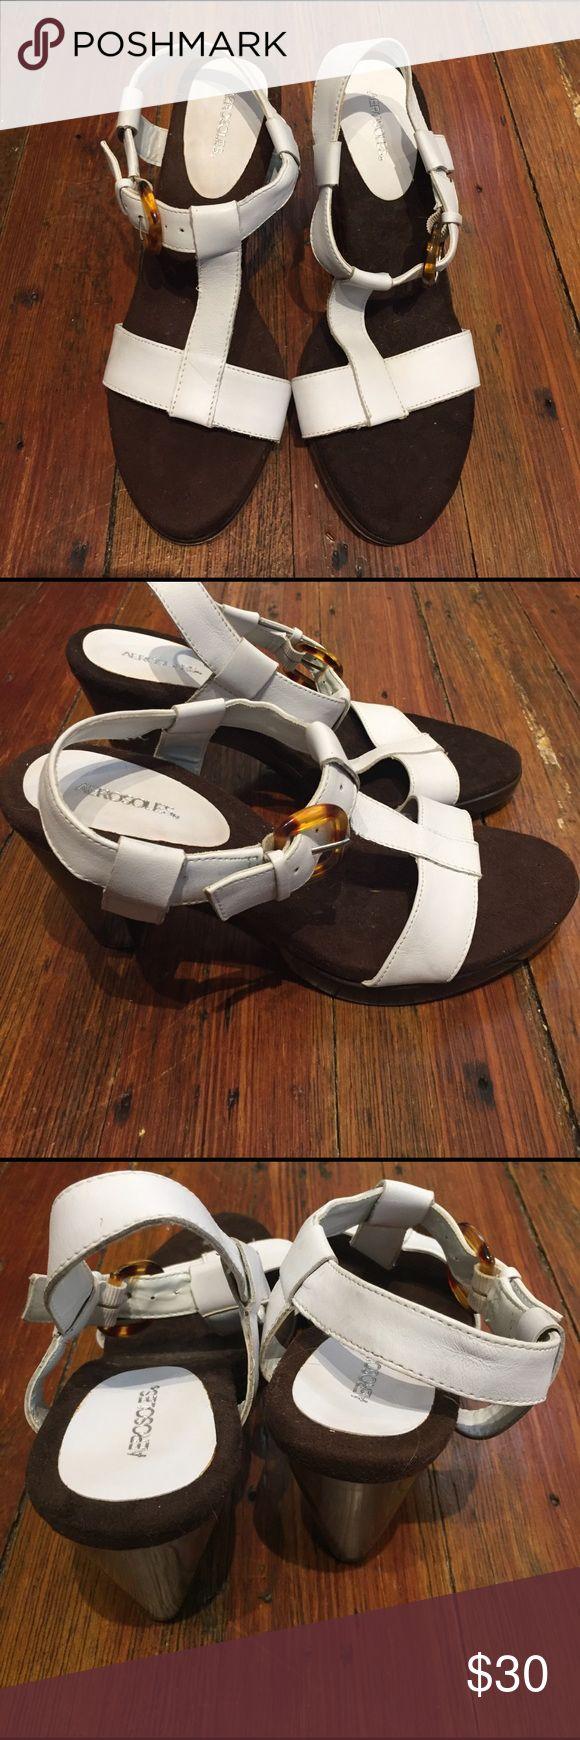 CUTE NEVER WORN WHITE HEELED SANDALS... SIZE 8... Cute Never Worn White Heeled Sandals.. Size 8.. AEROSOLES Shoes